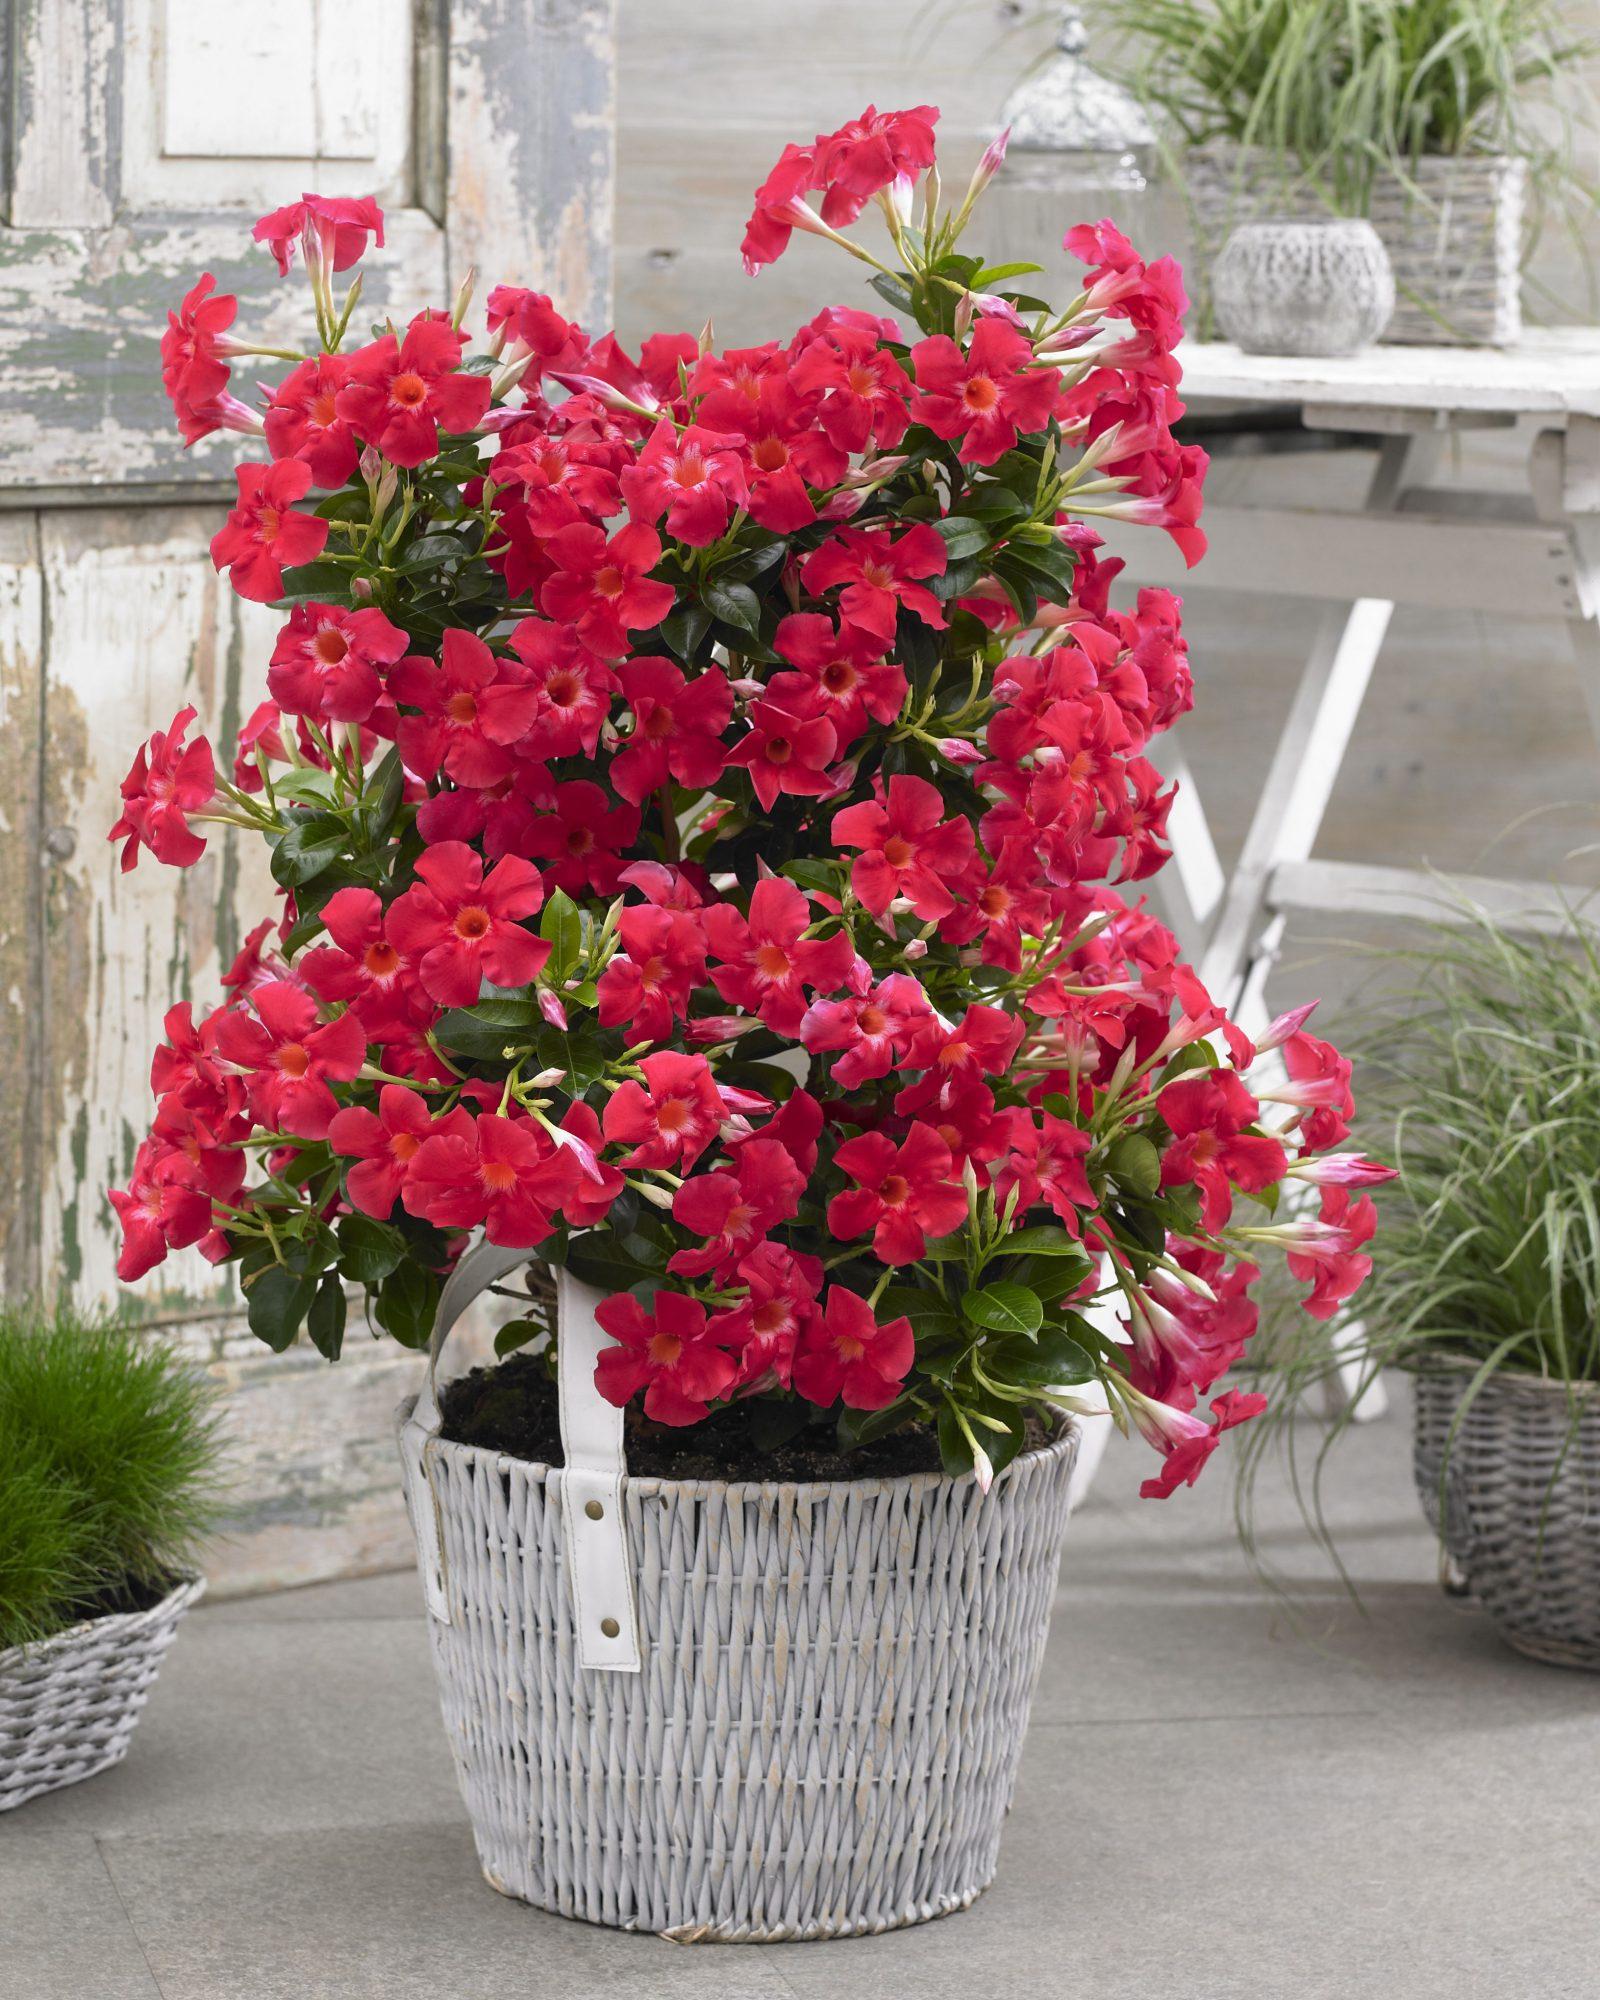 Sundenia Coral plant